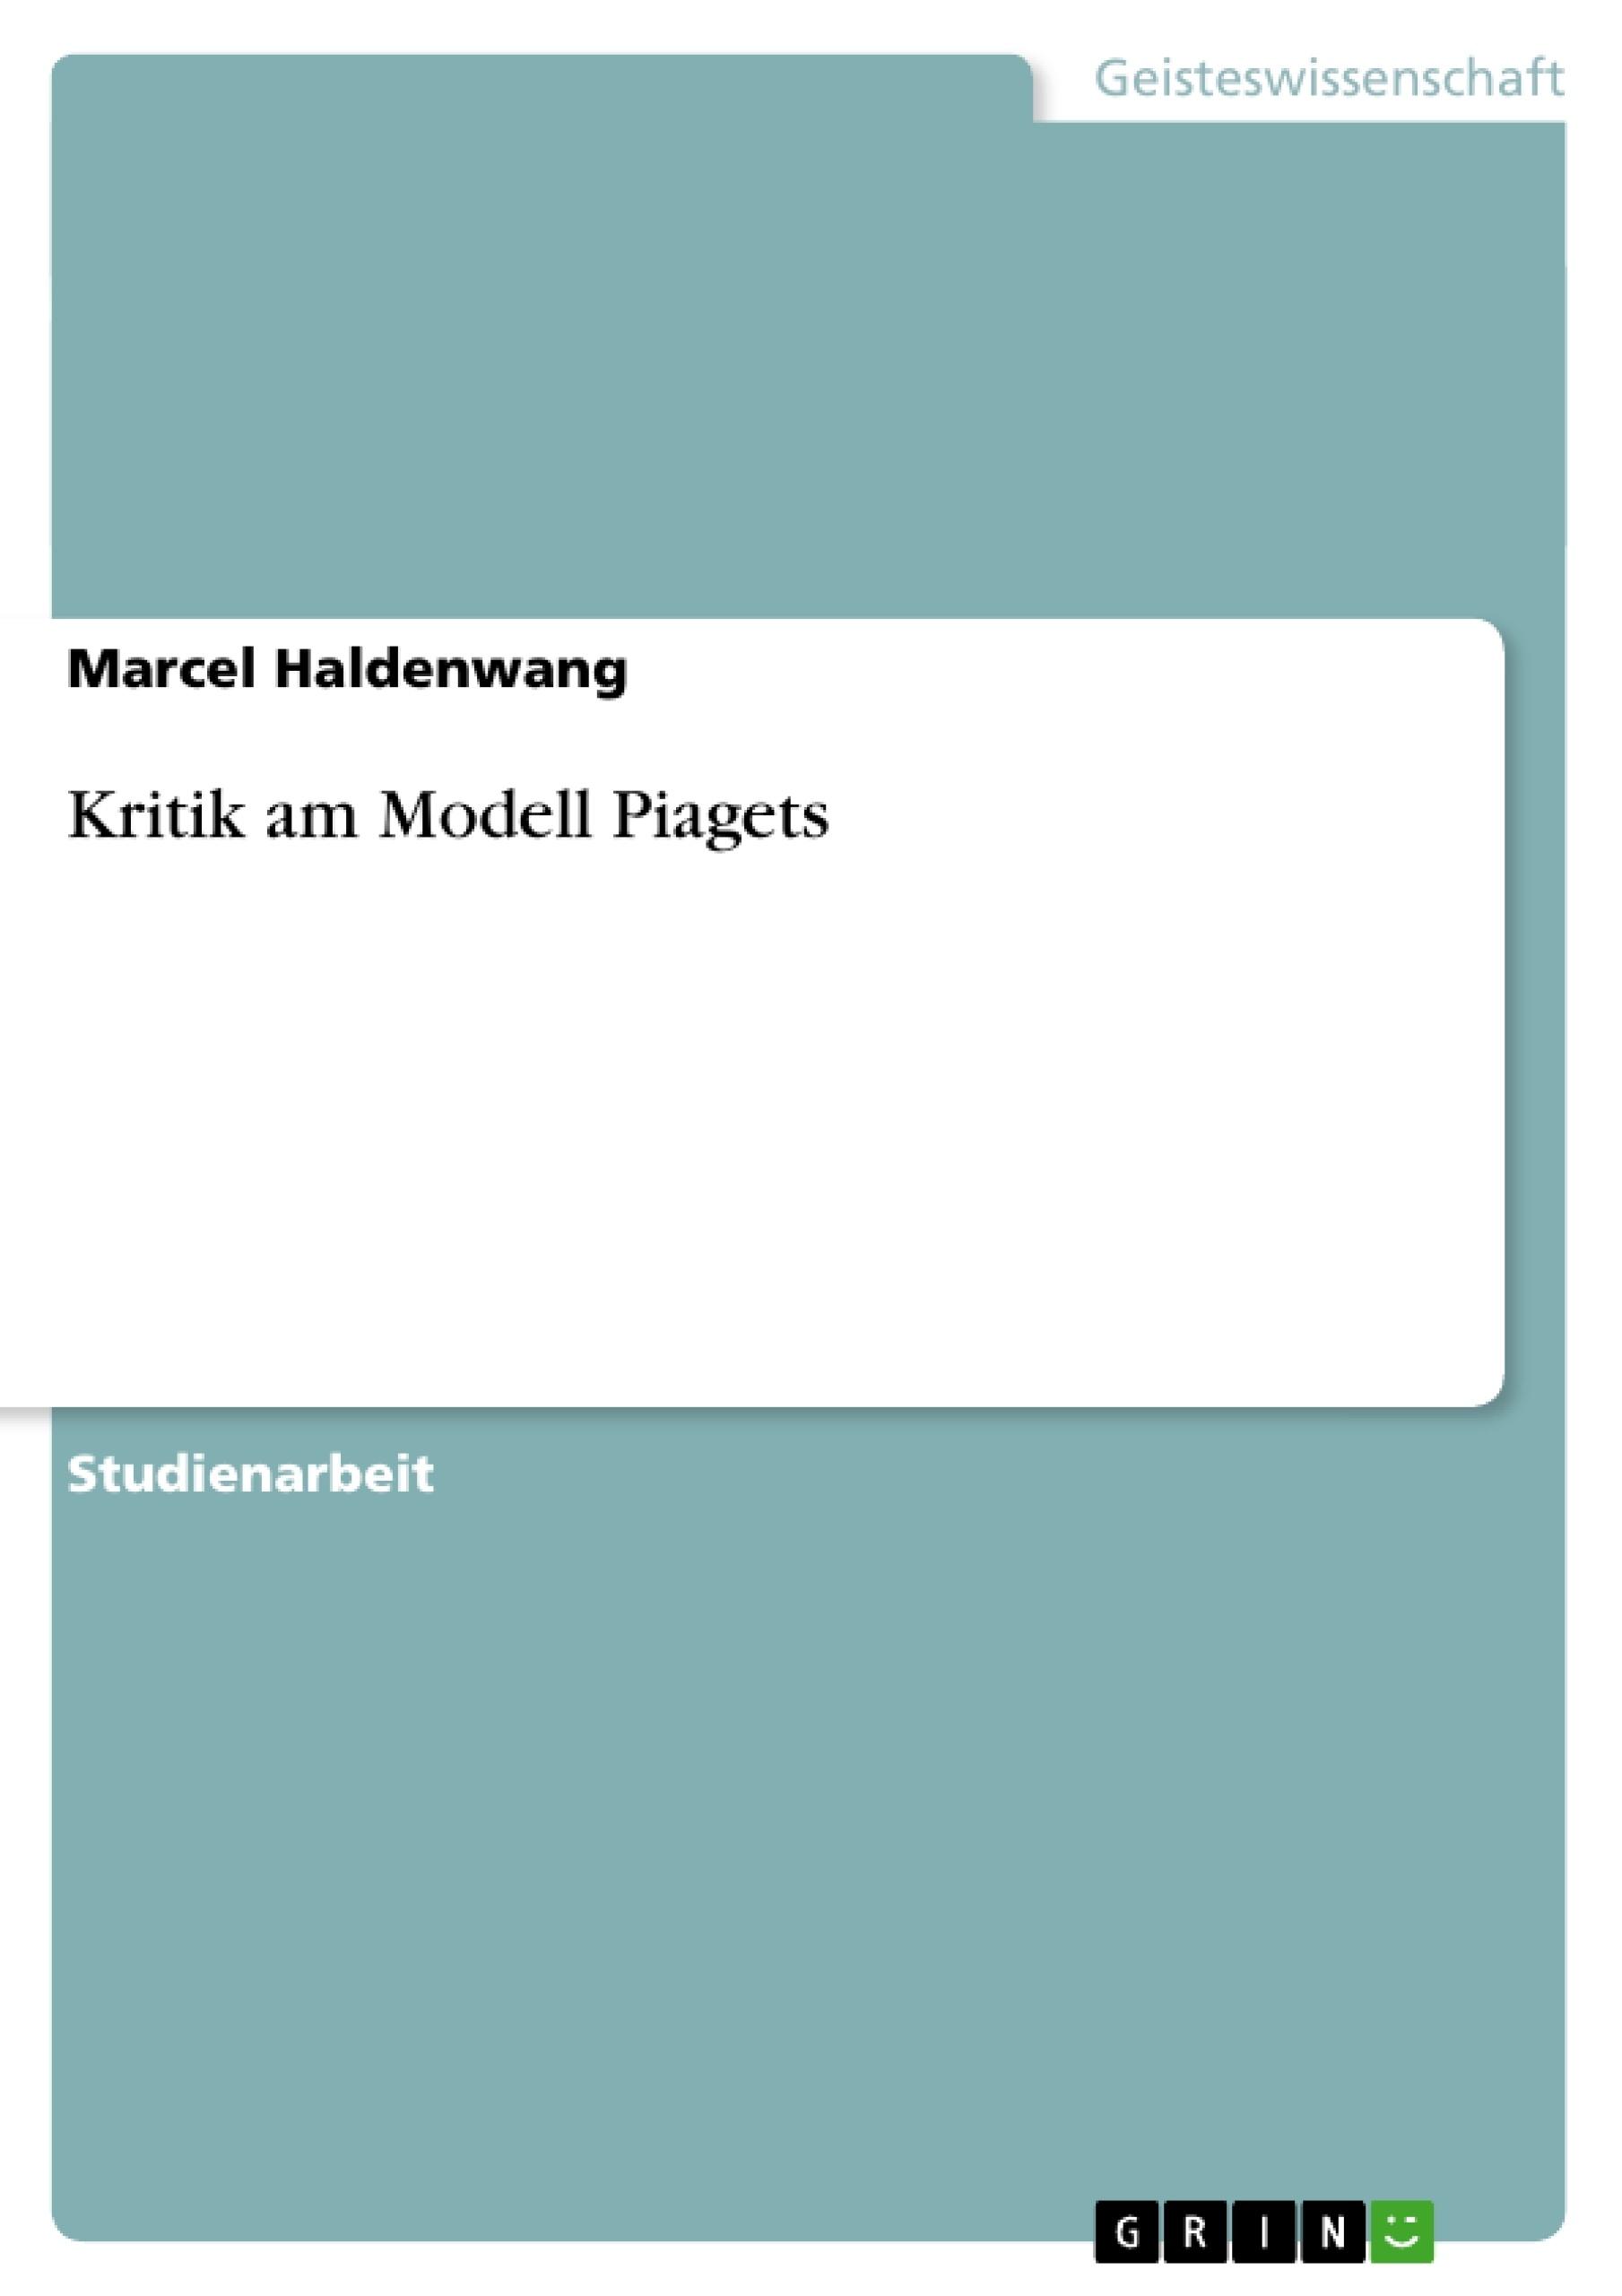 Titel: Kritik am Modell Piagets